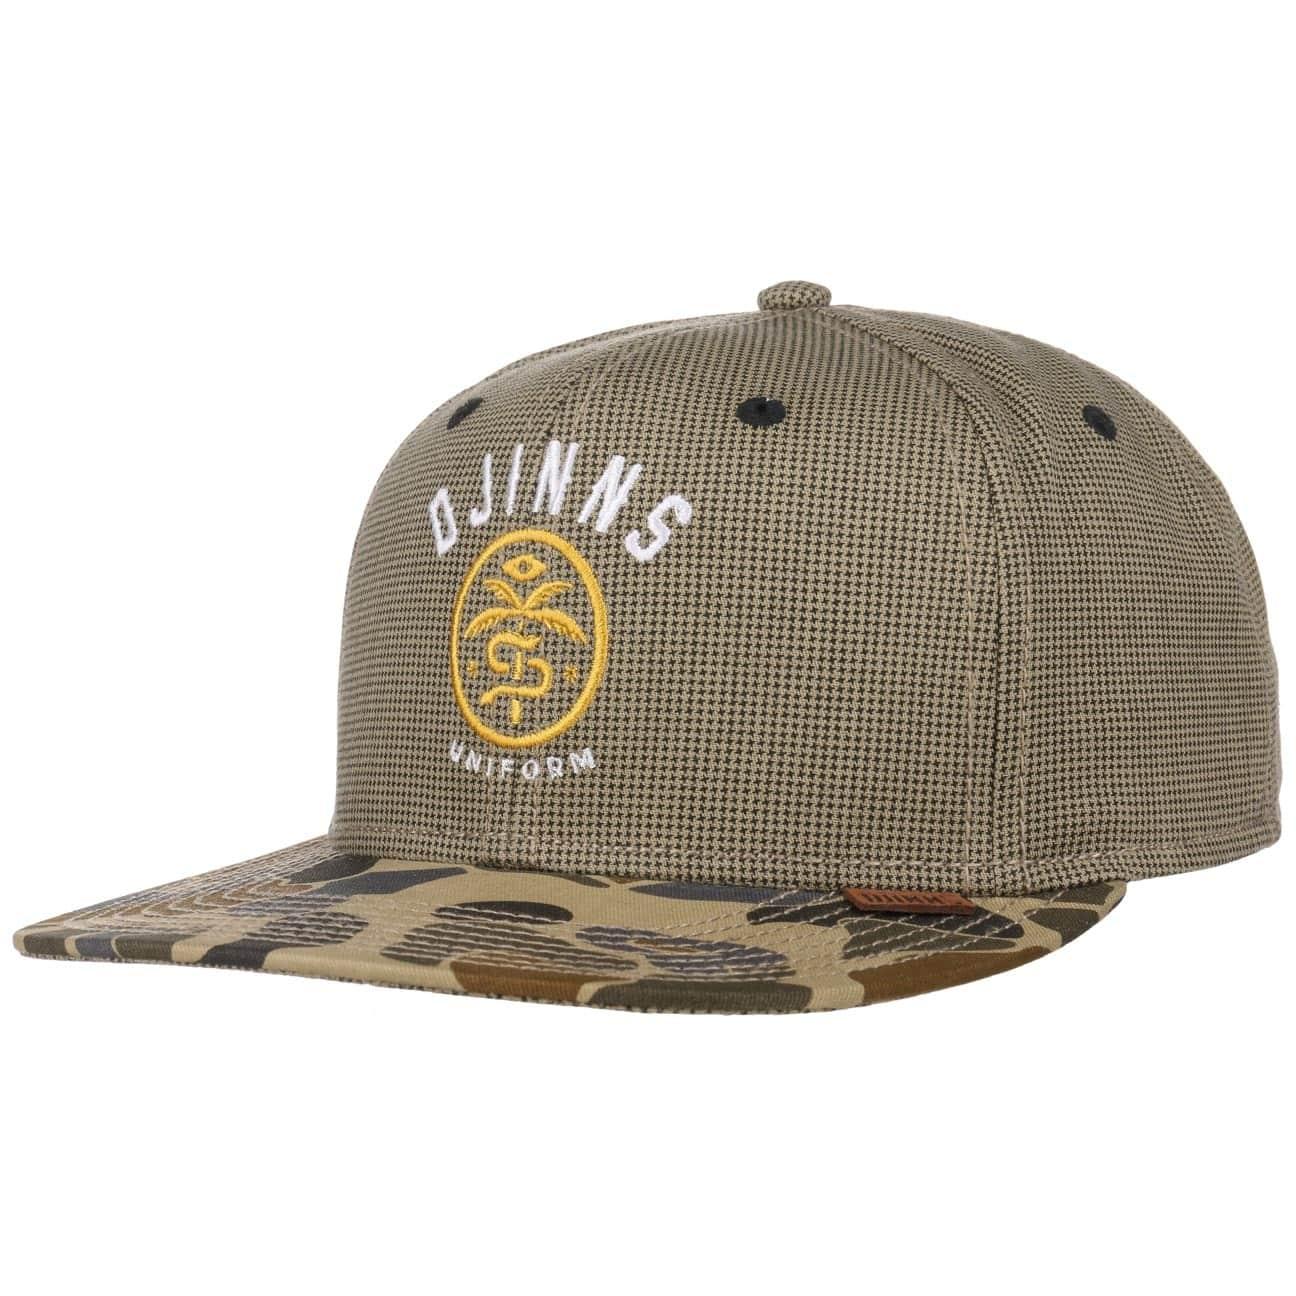 Casquette Camo Brim Snapback by Djinns  baseball cap